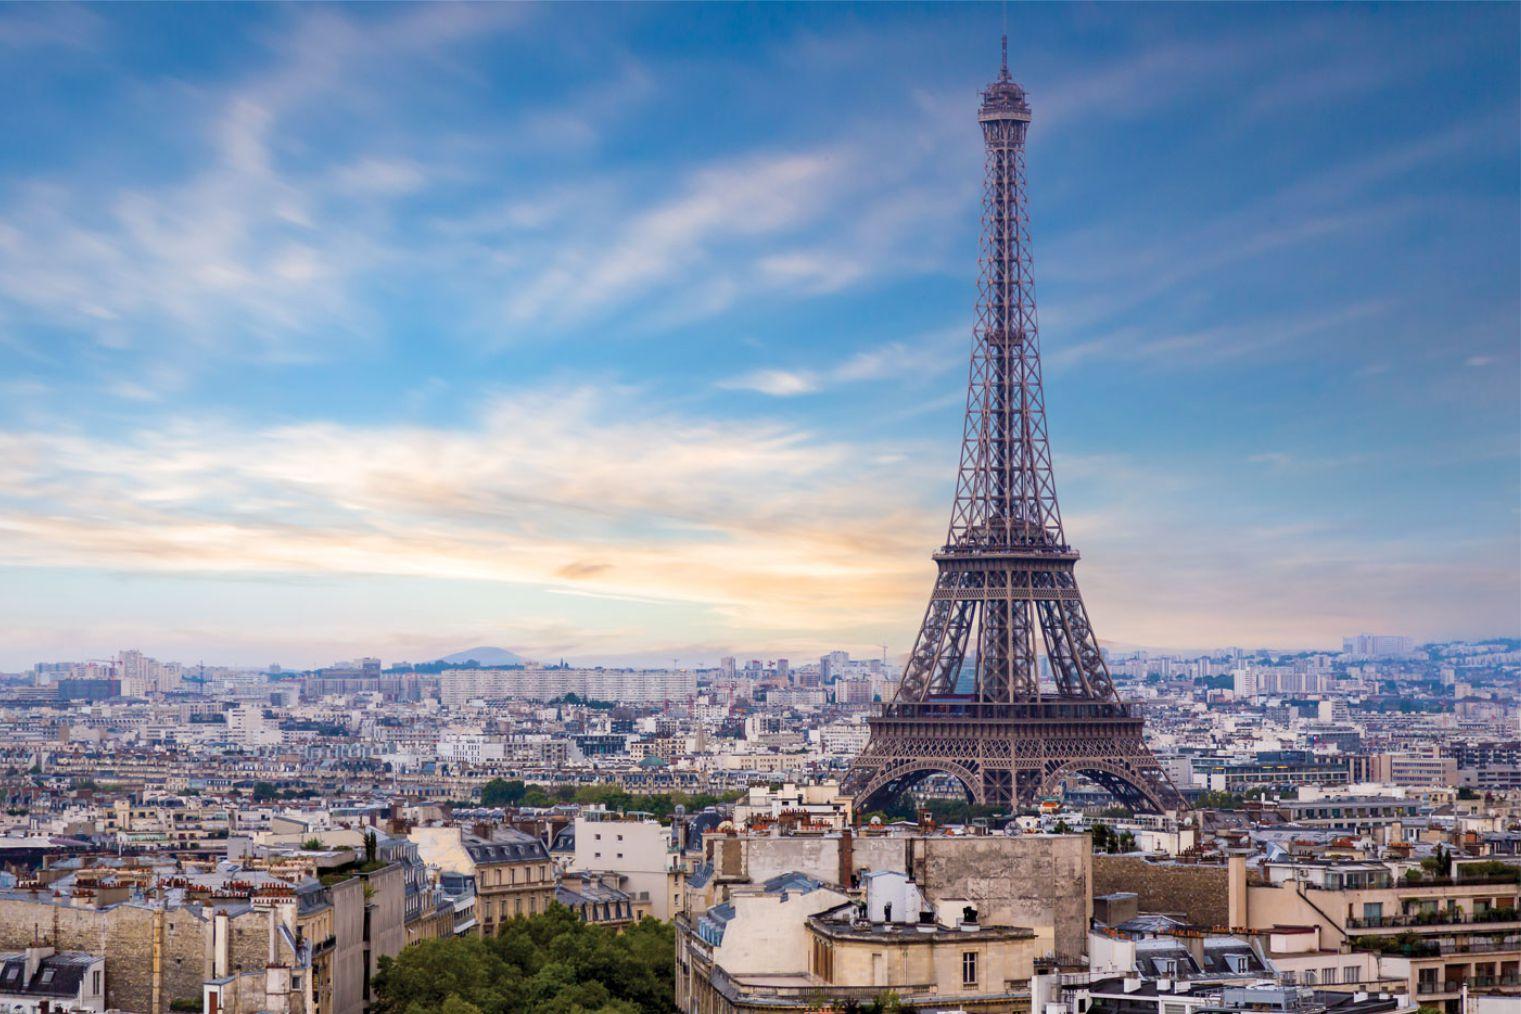 Eiffel Tower. Эйфелева башня, Париж.